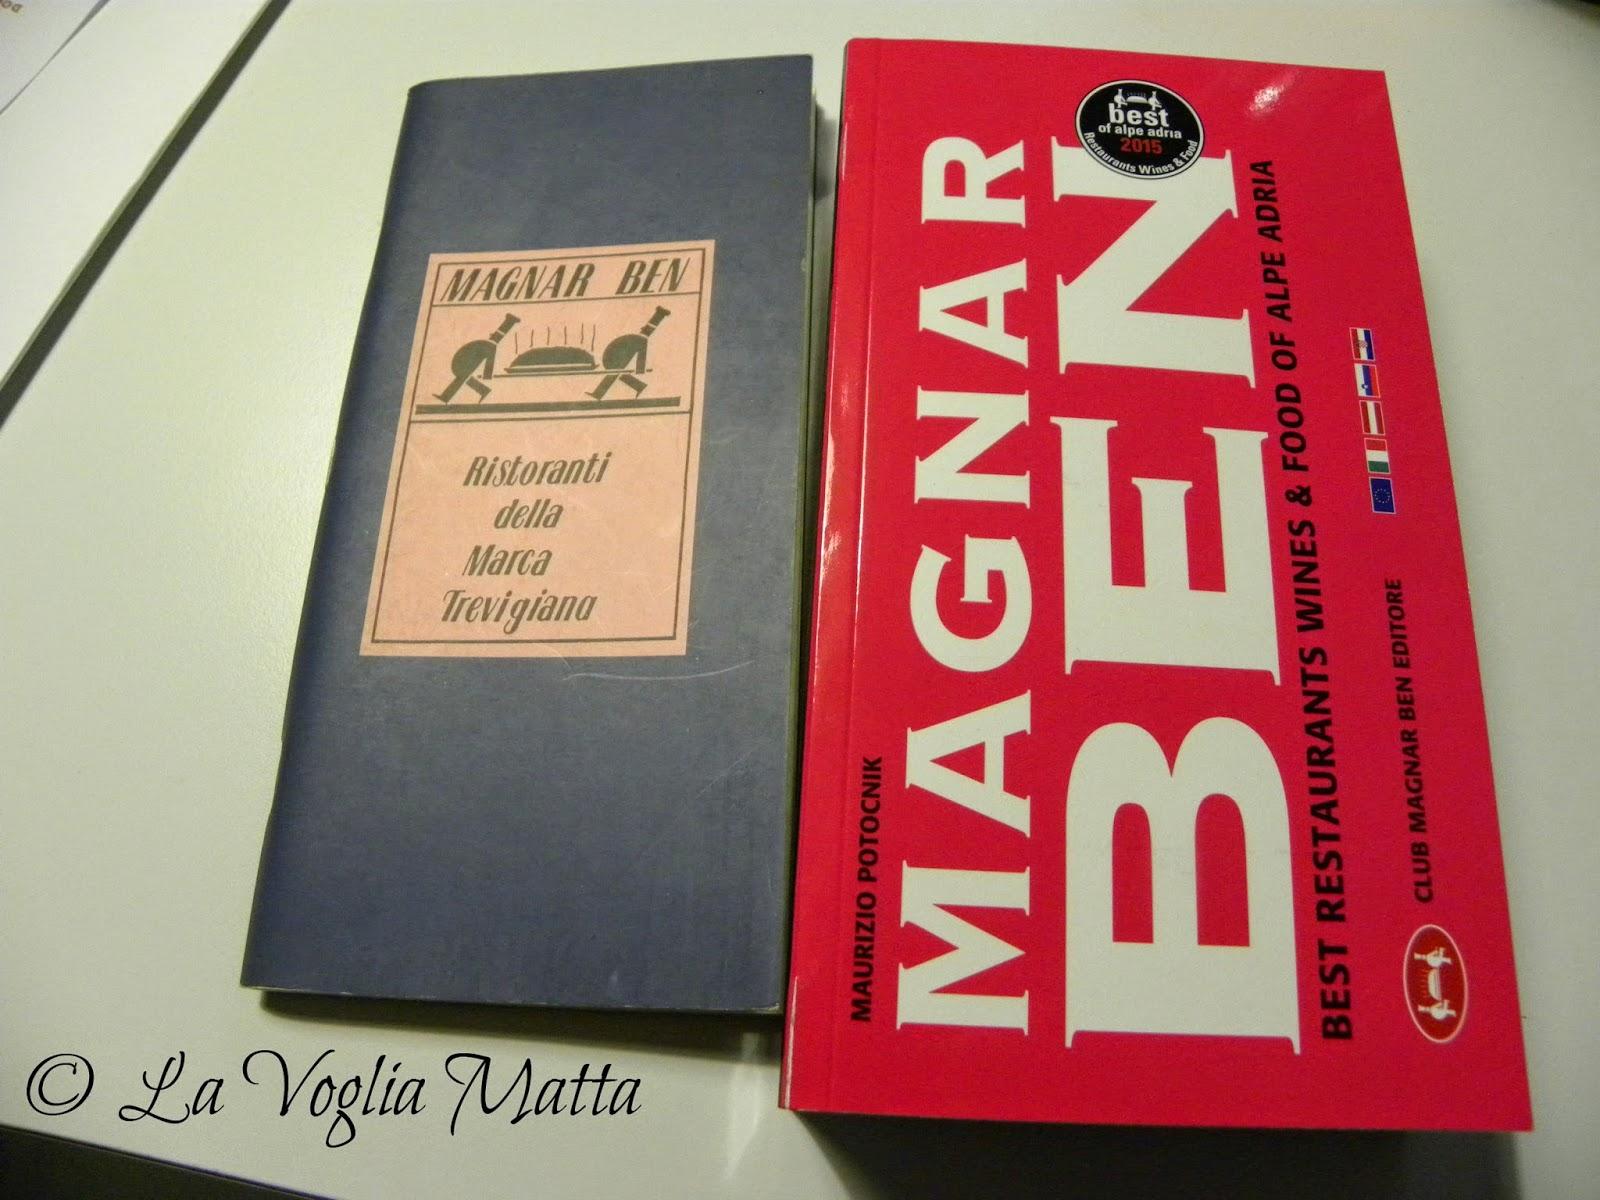 guide Magnar Ben